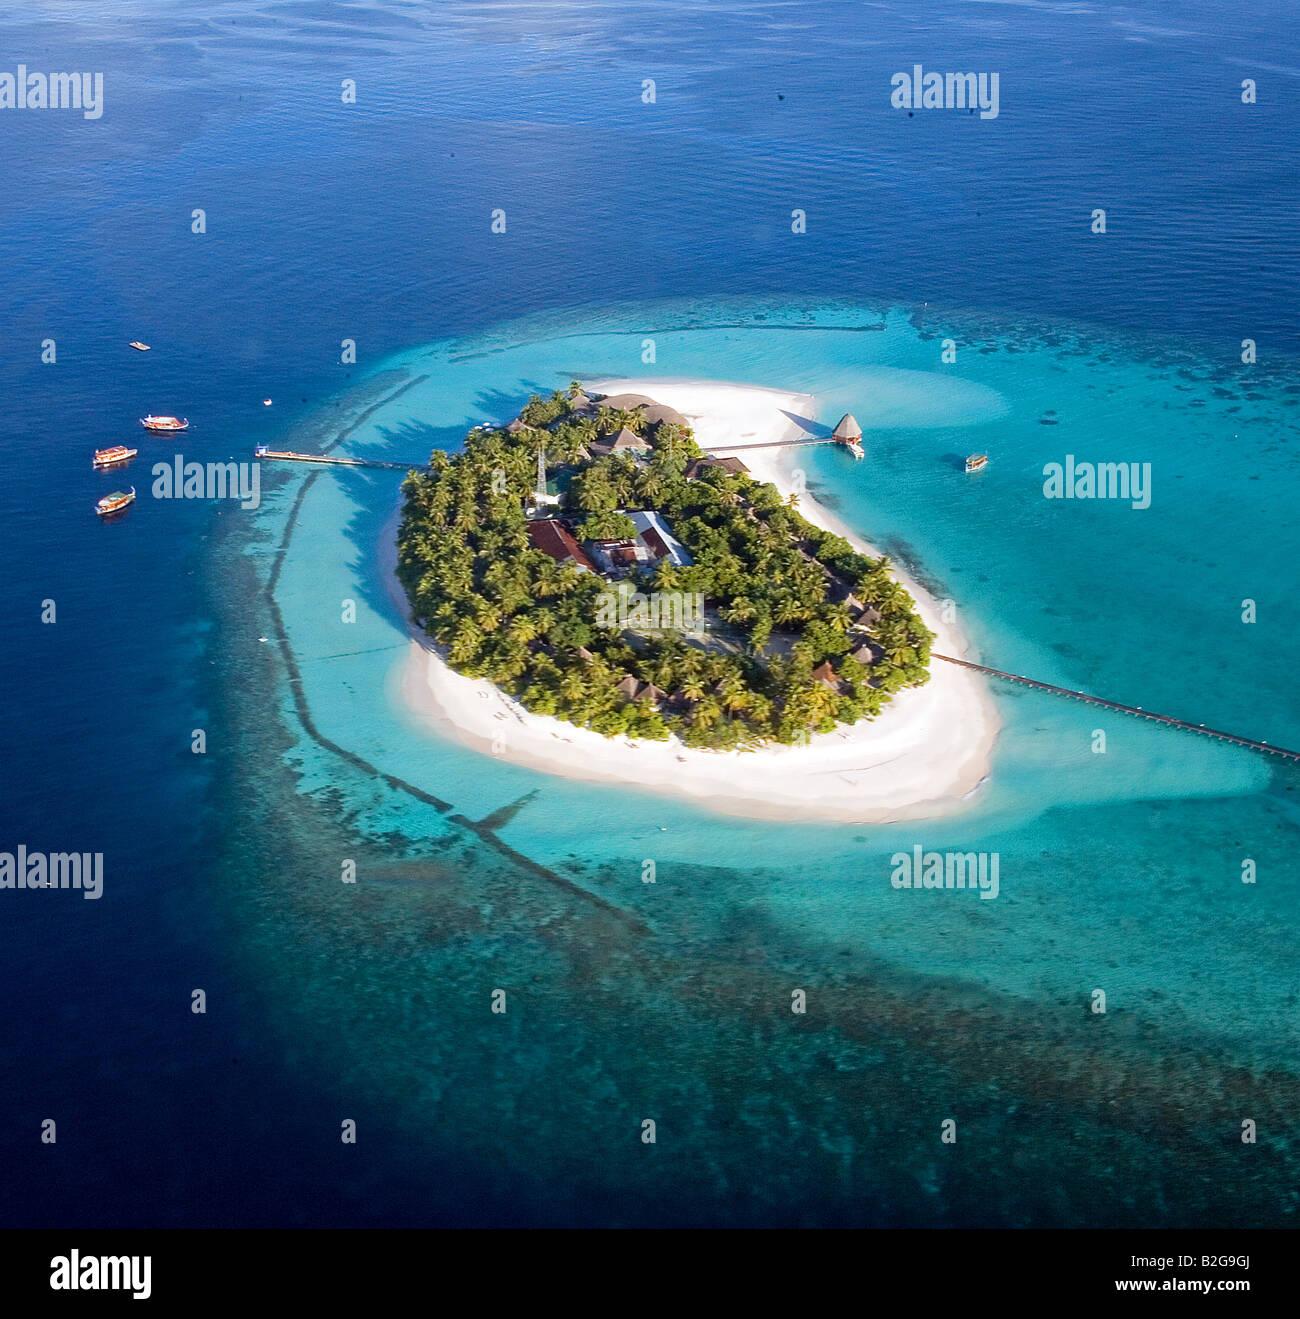 Malediven maledives reisefotos urlaubsfotos holiday photos vacation photo - Stock Image